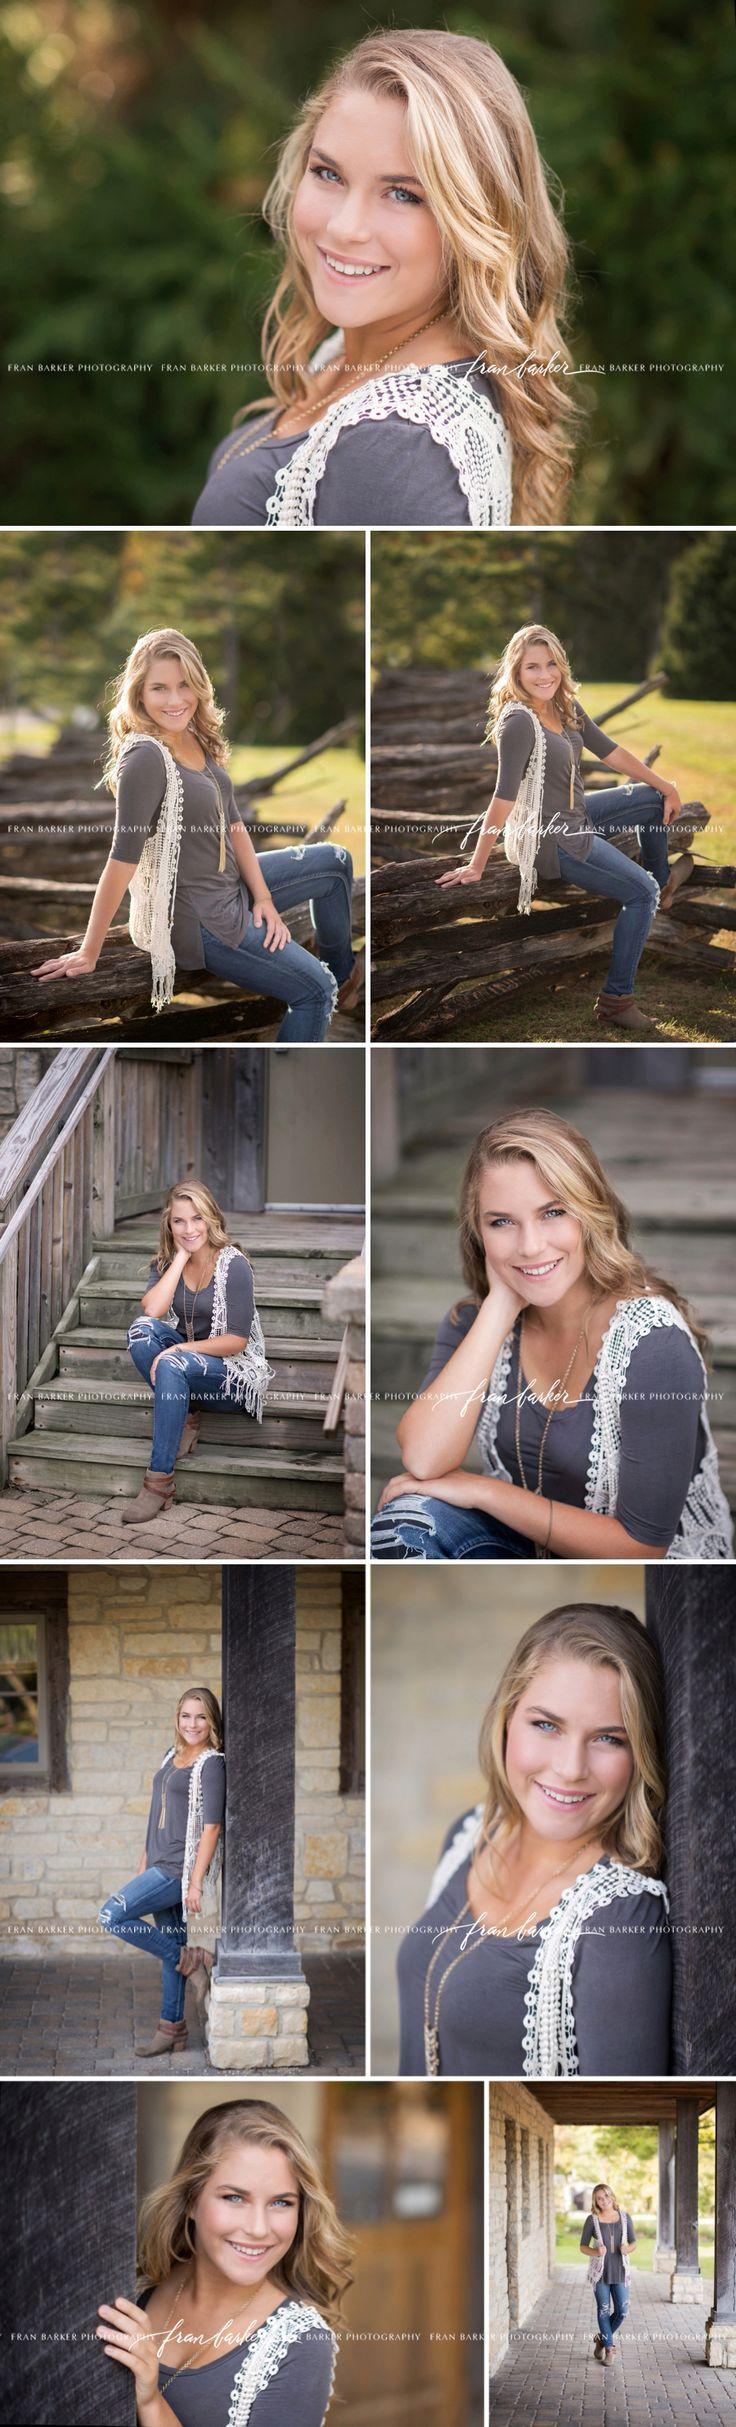 Olentangy Senior Pictures  | Columbus Photographer